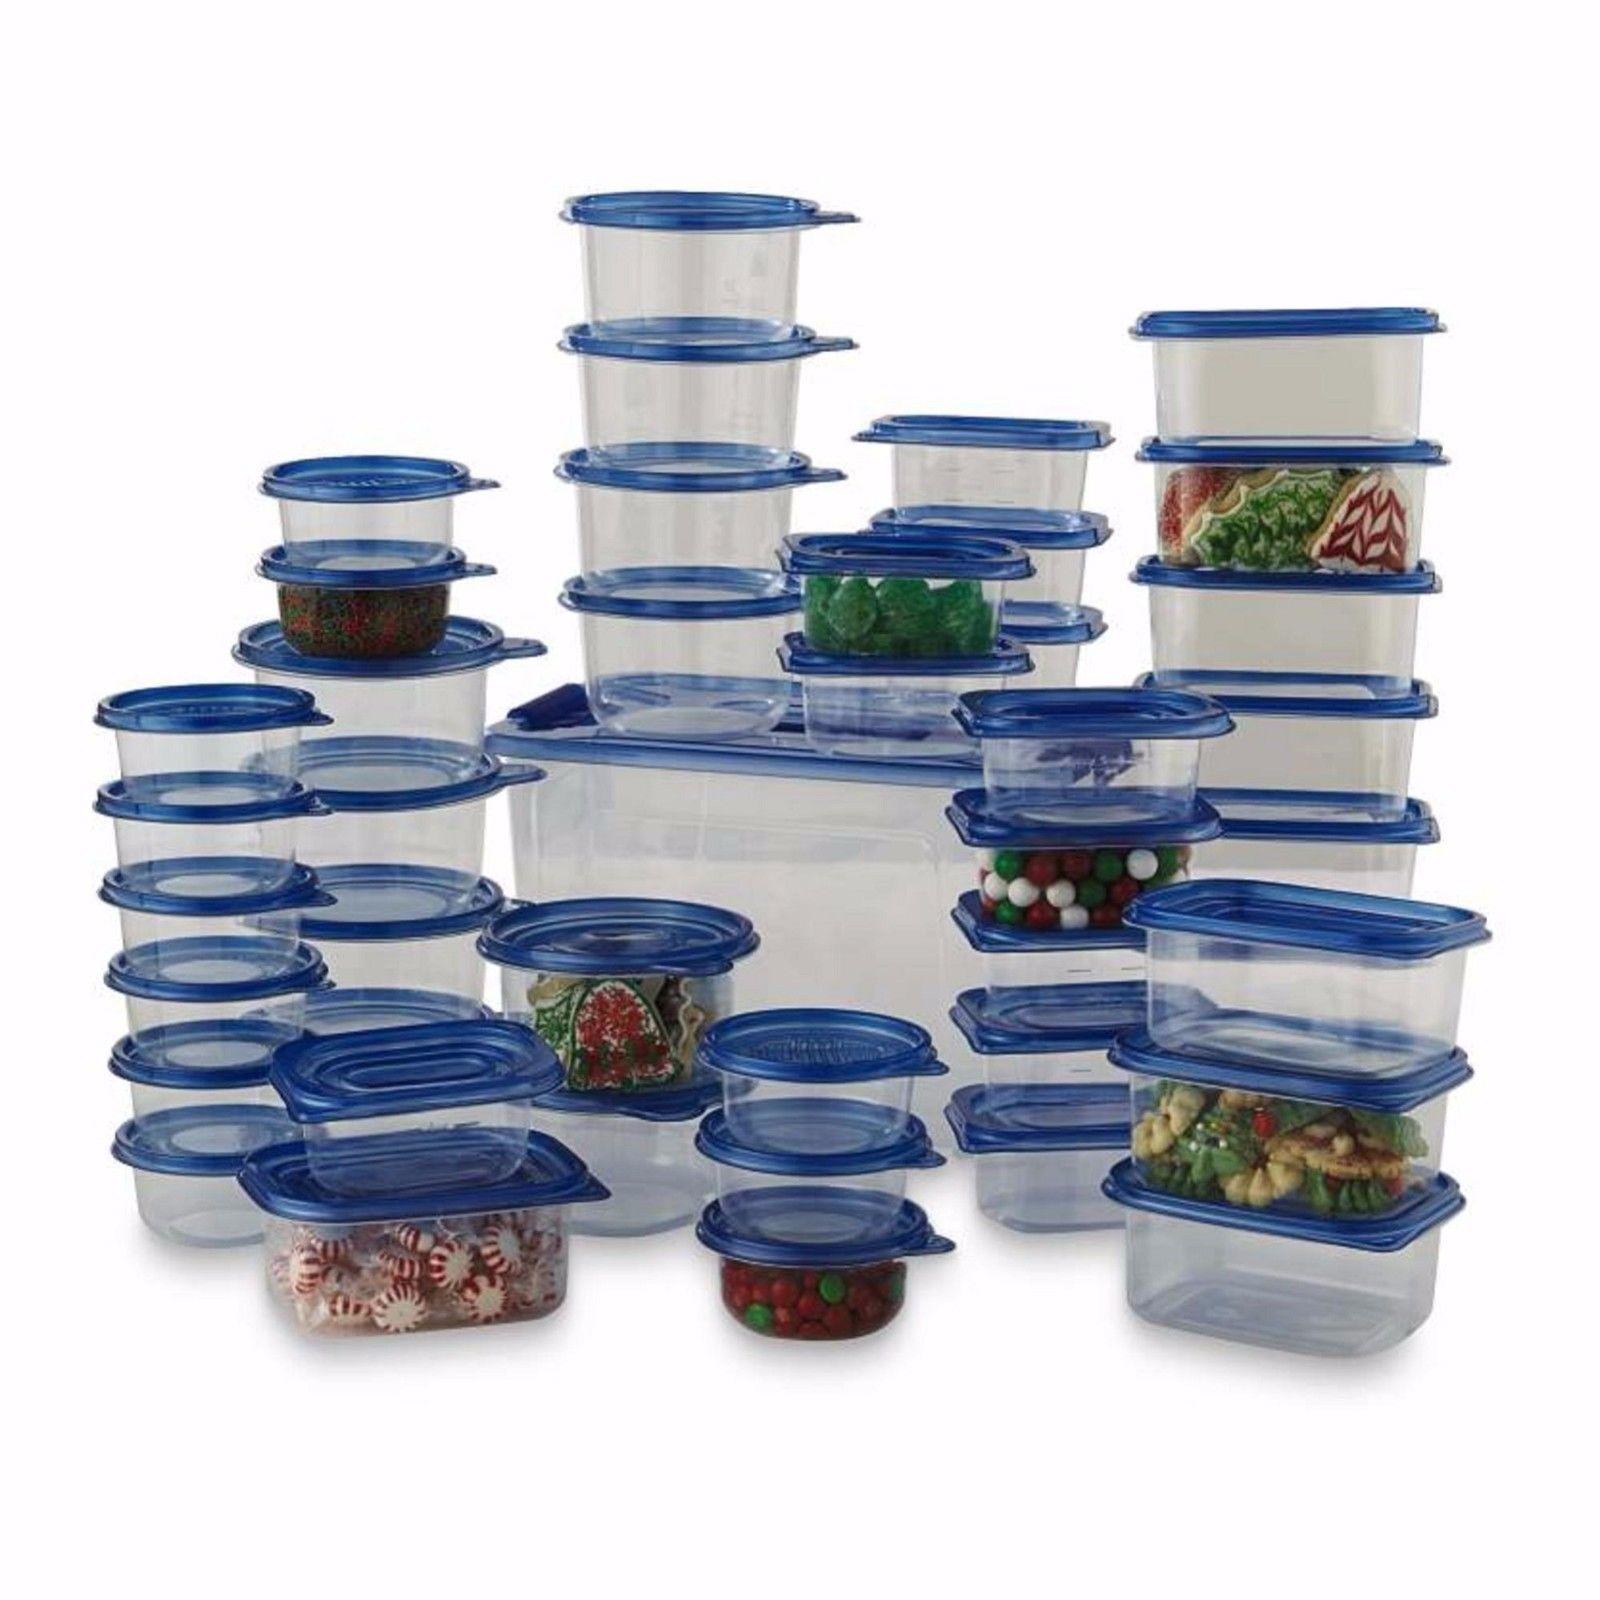 88 Pc Plastic Food Storage Container Set 12 99 Free